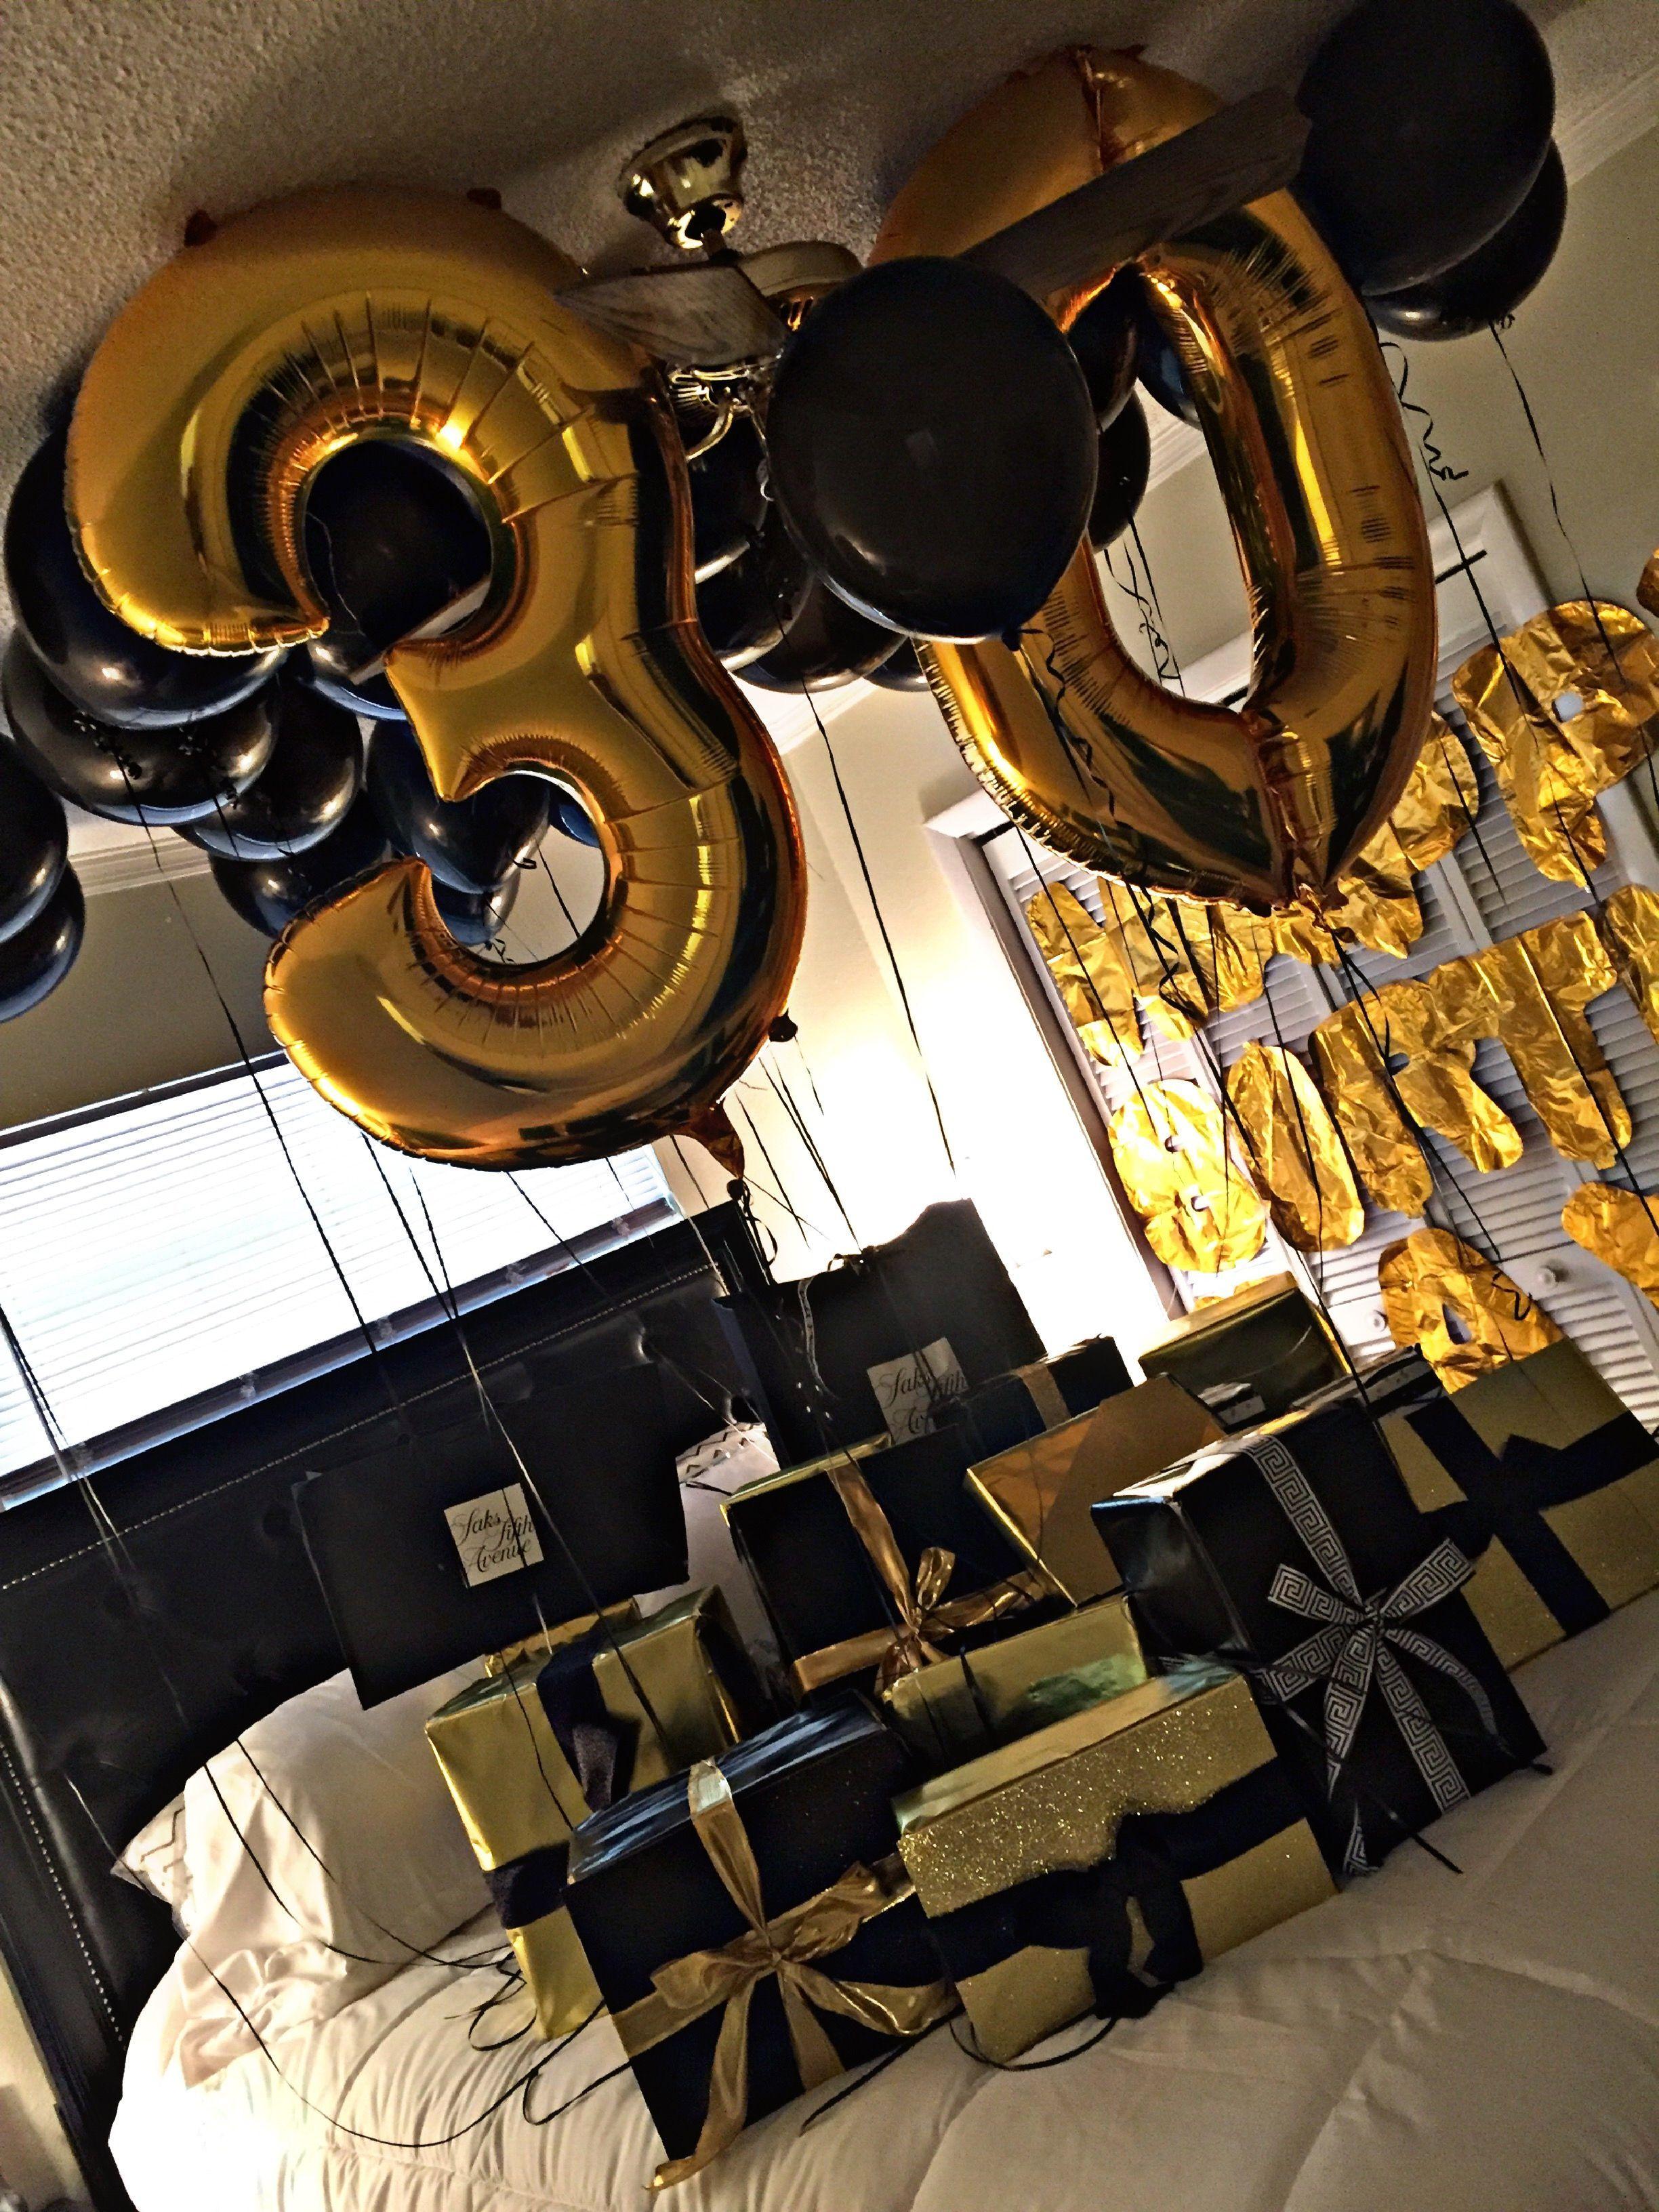 30 Gifts For My Husband 30th Birthday Boyfriendbirthdaygifts